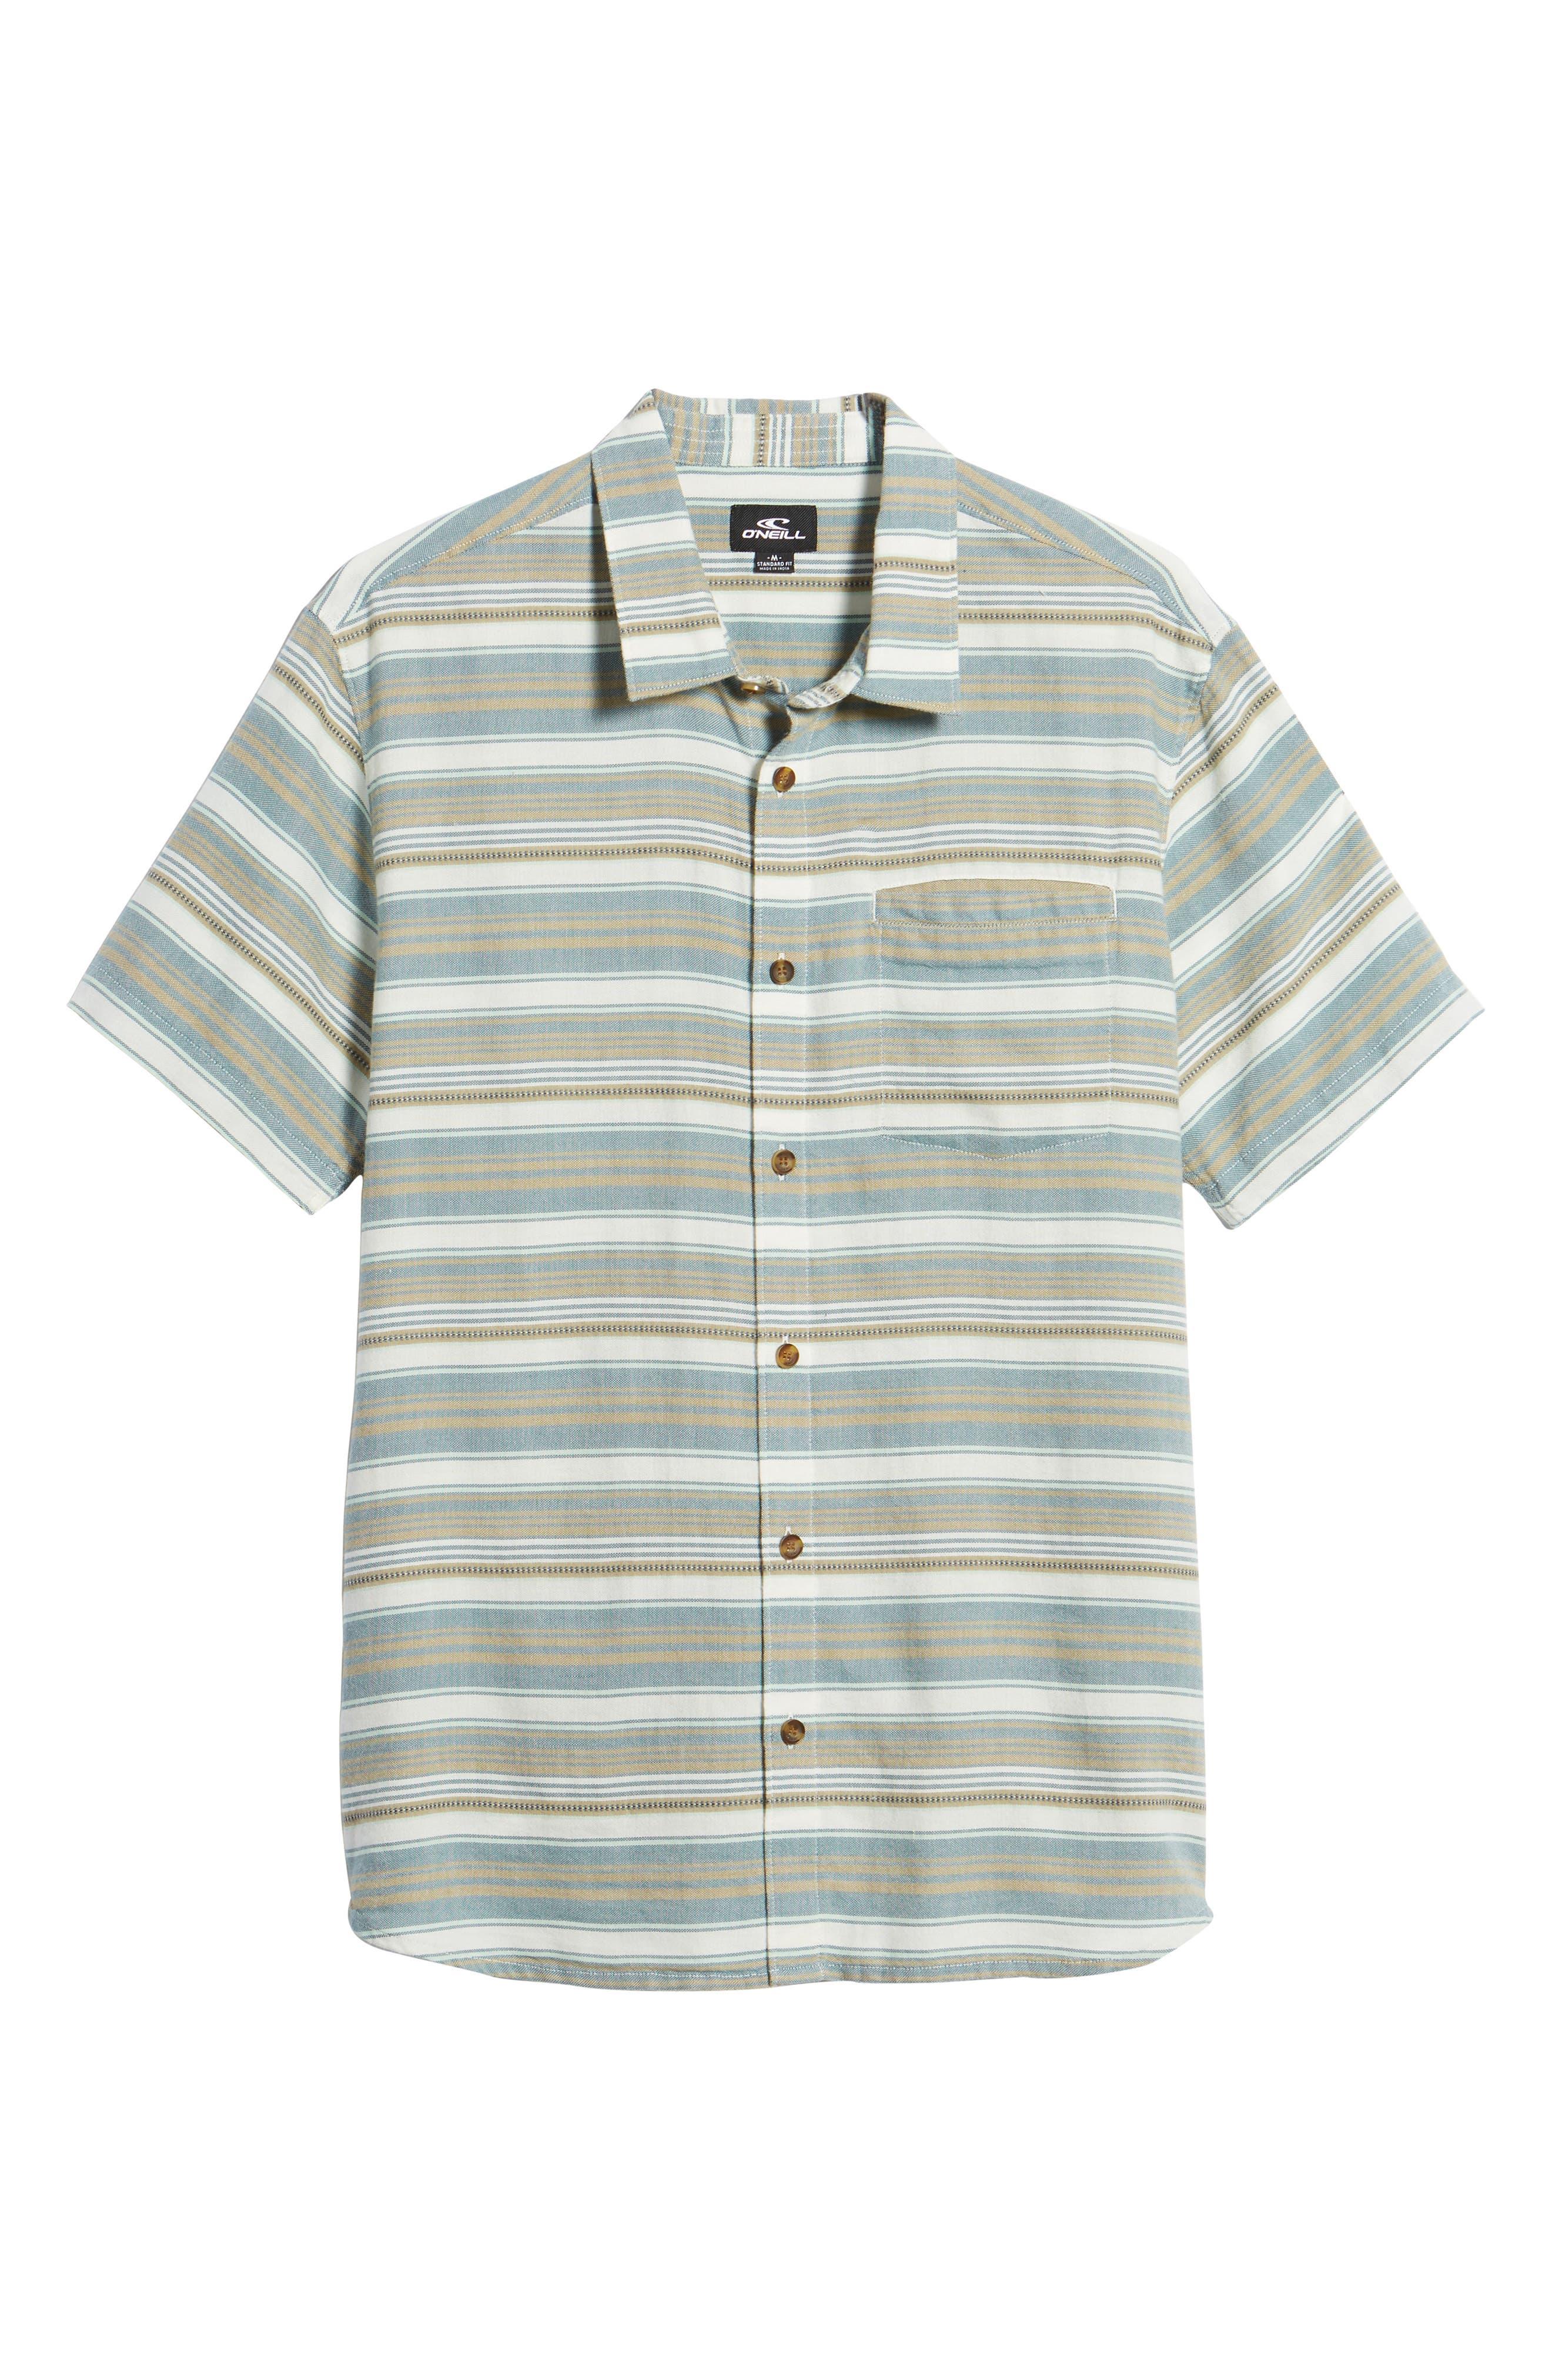 Currington Short Sleeve Shirt,                             Alternate thumbnail 6, color,                             251